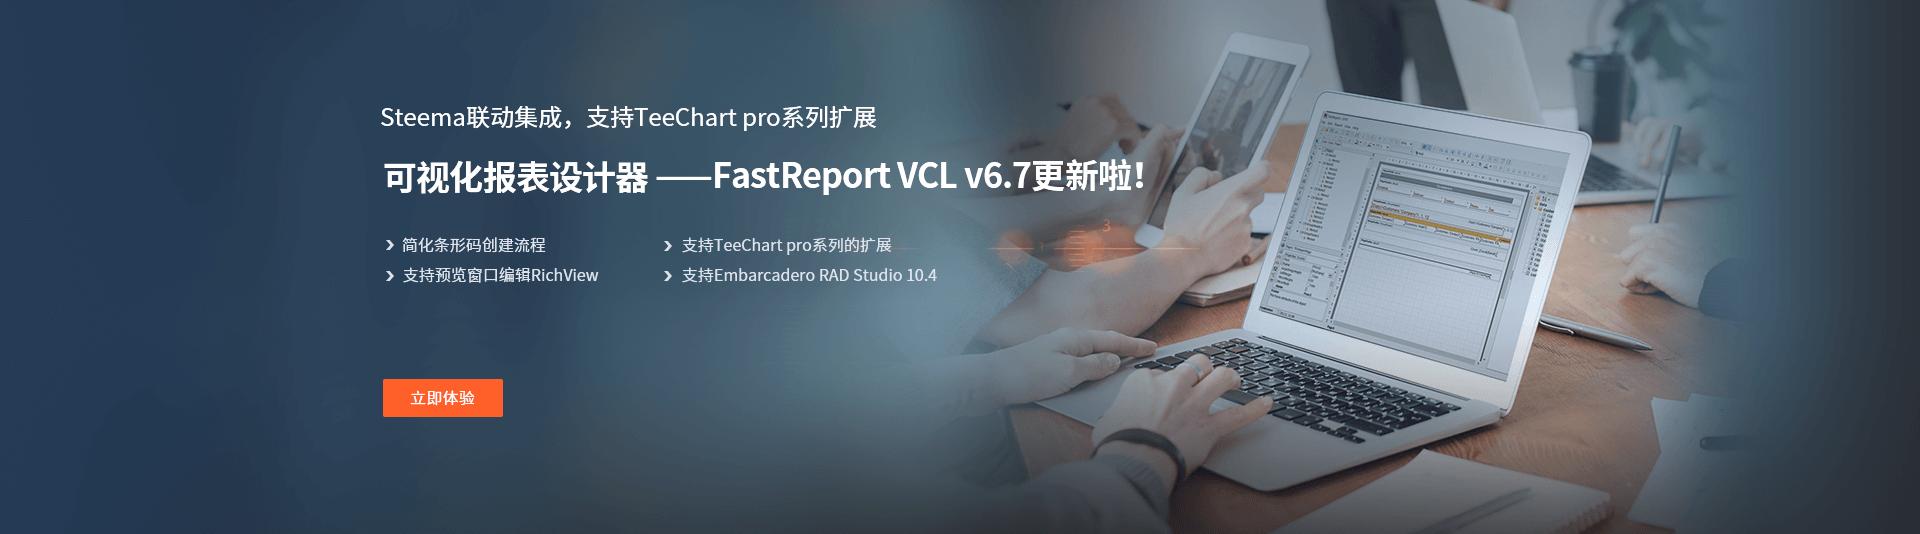 FastReport_VCL_6.7版本更新